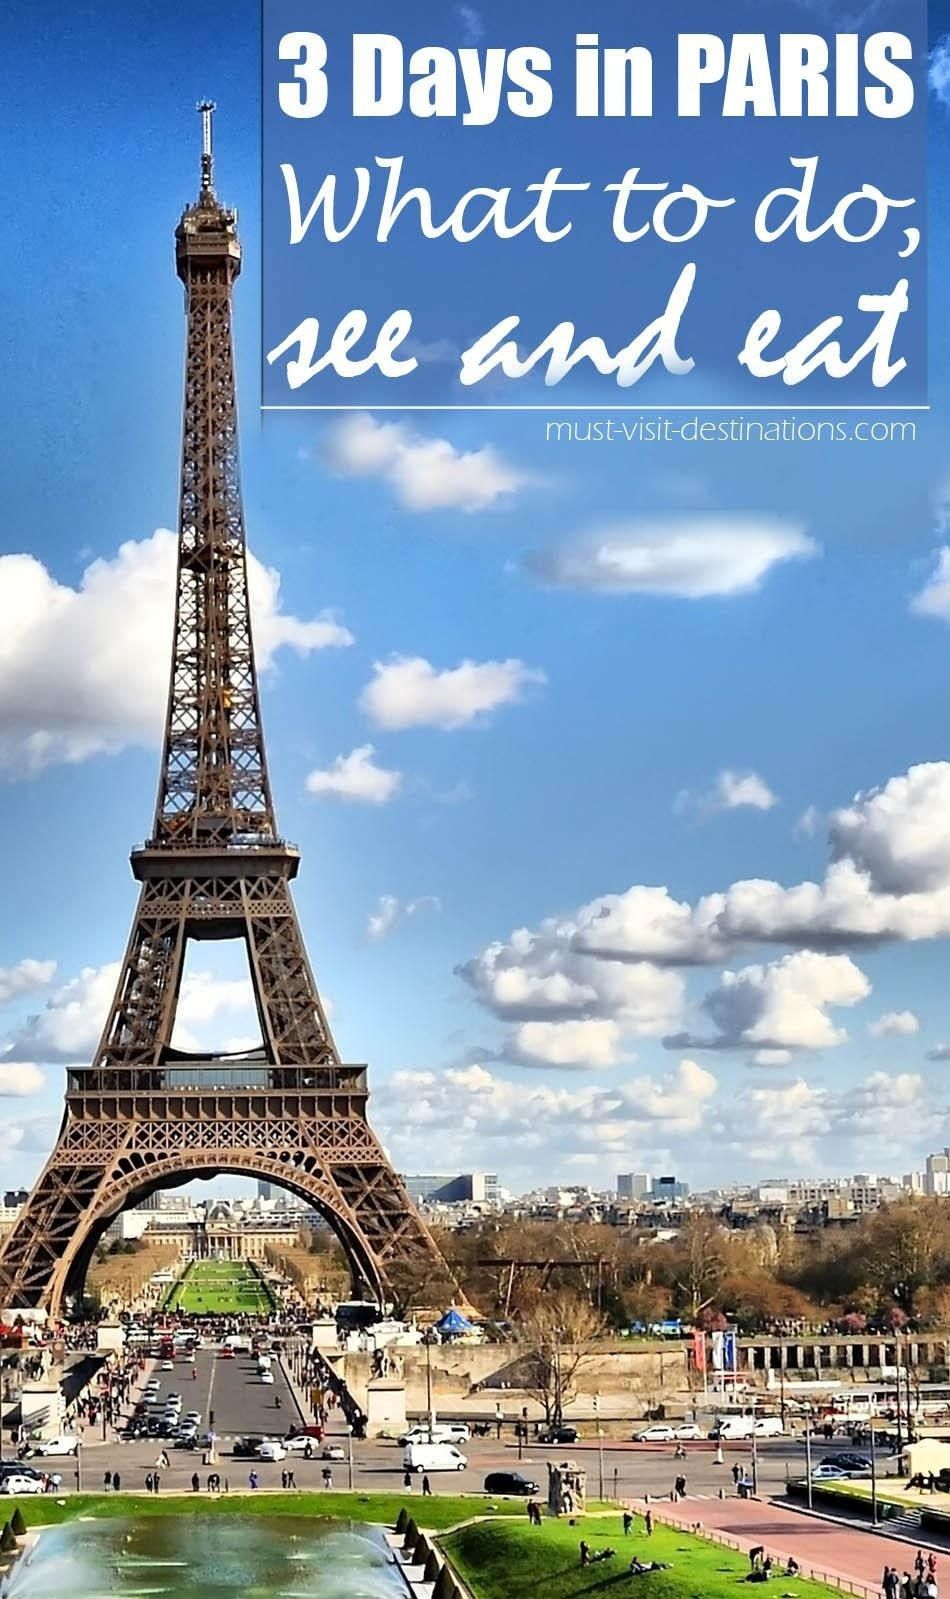 Best Things To Do In Paris In 3 Days Paris In 3 Days Paris Things To Do Paris Travel